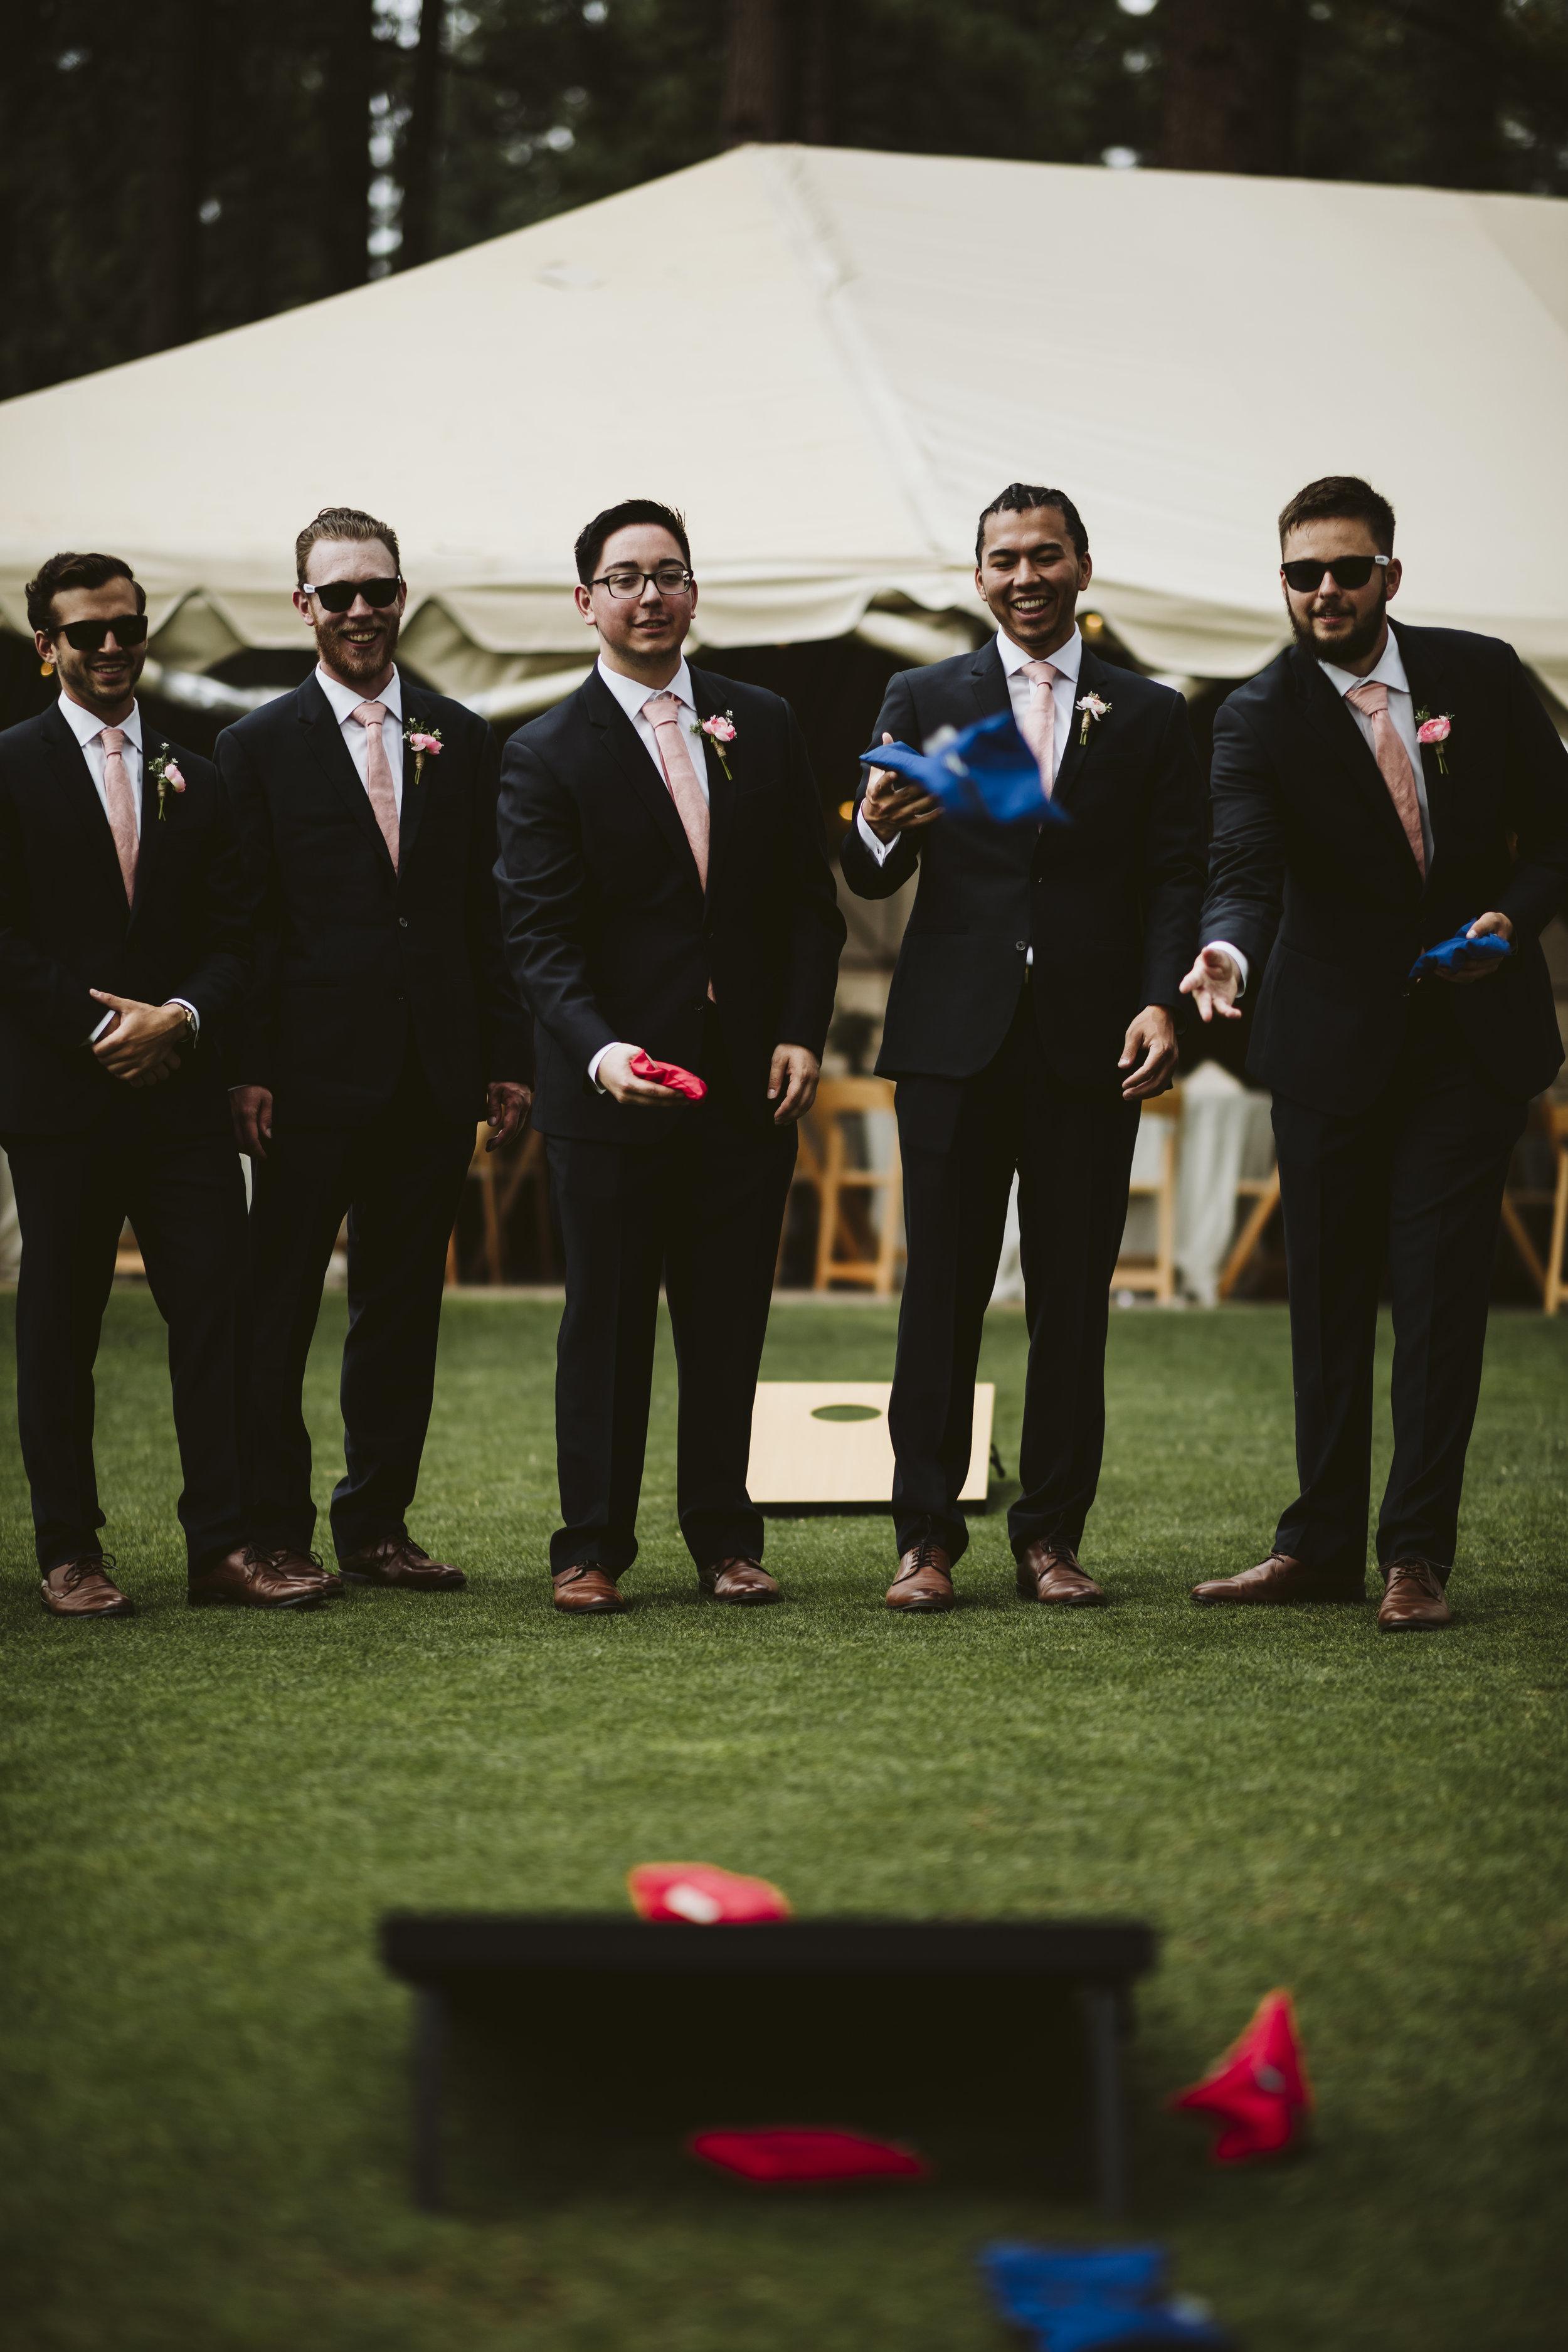 _P8A4097vild-vild photography-photography-wedding-wedding photography-tahoe-lake tahoe-lake tahoe wedding photographer-nevada wedding photographer-mountain wedding.jpg